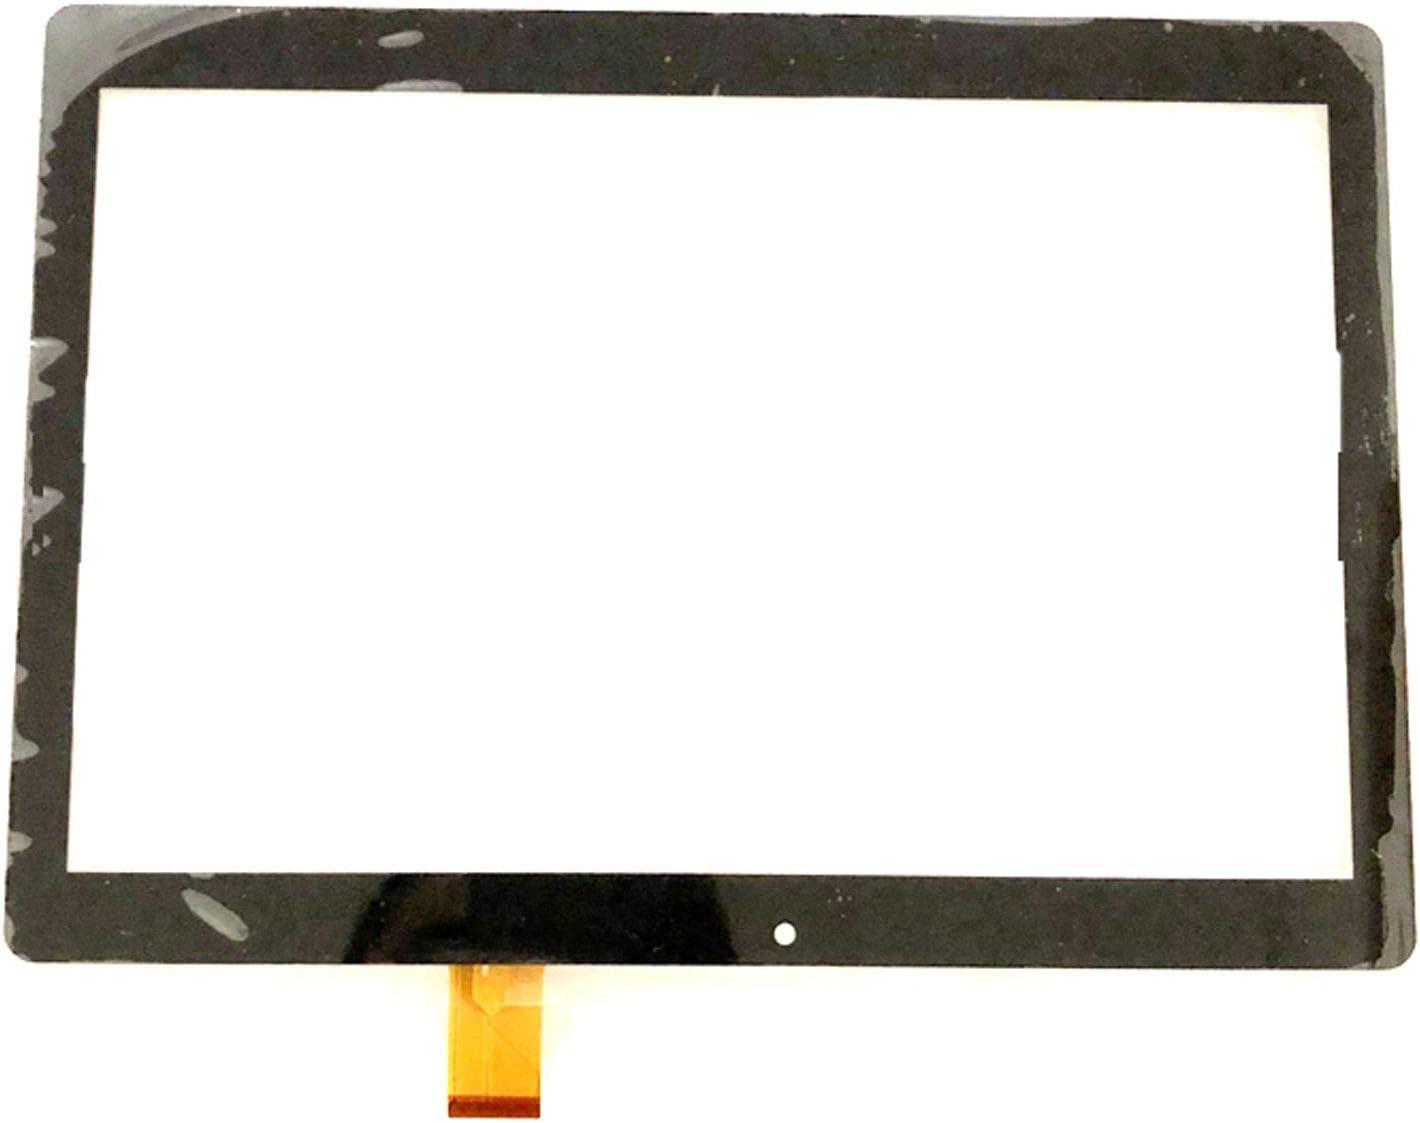 Modern Gradient Window Cling Do Not Enter 36x12 5-Pack CGSignLab